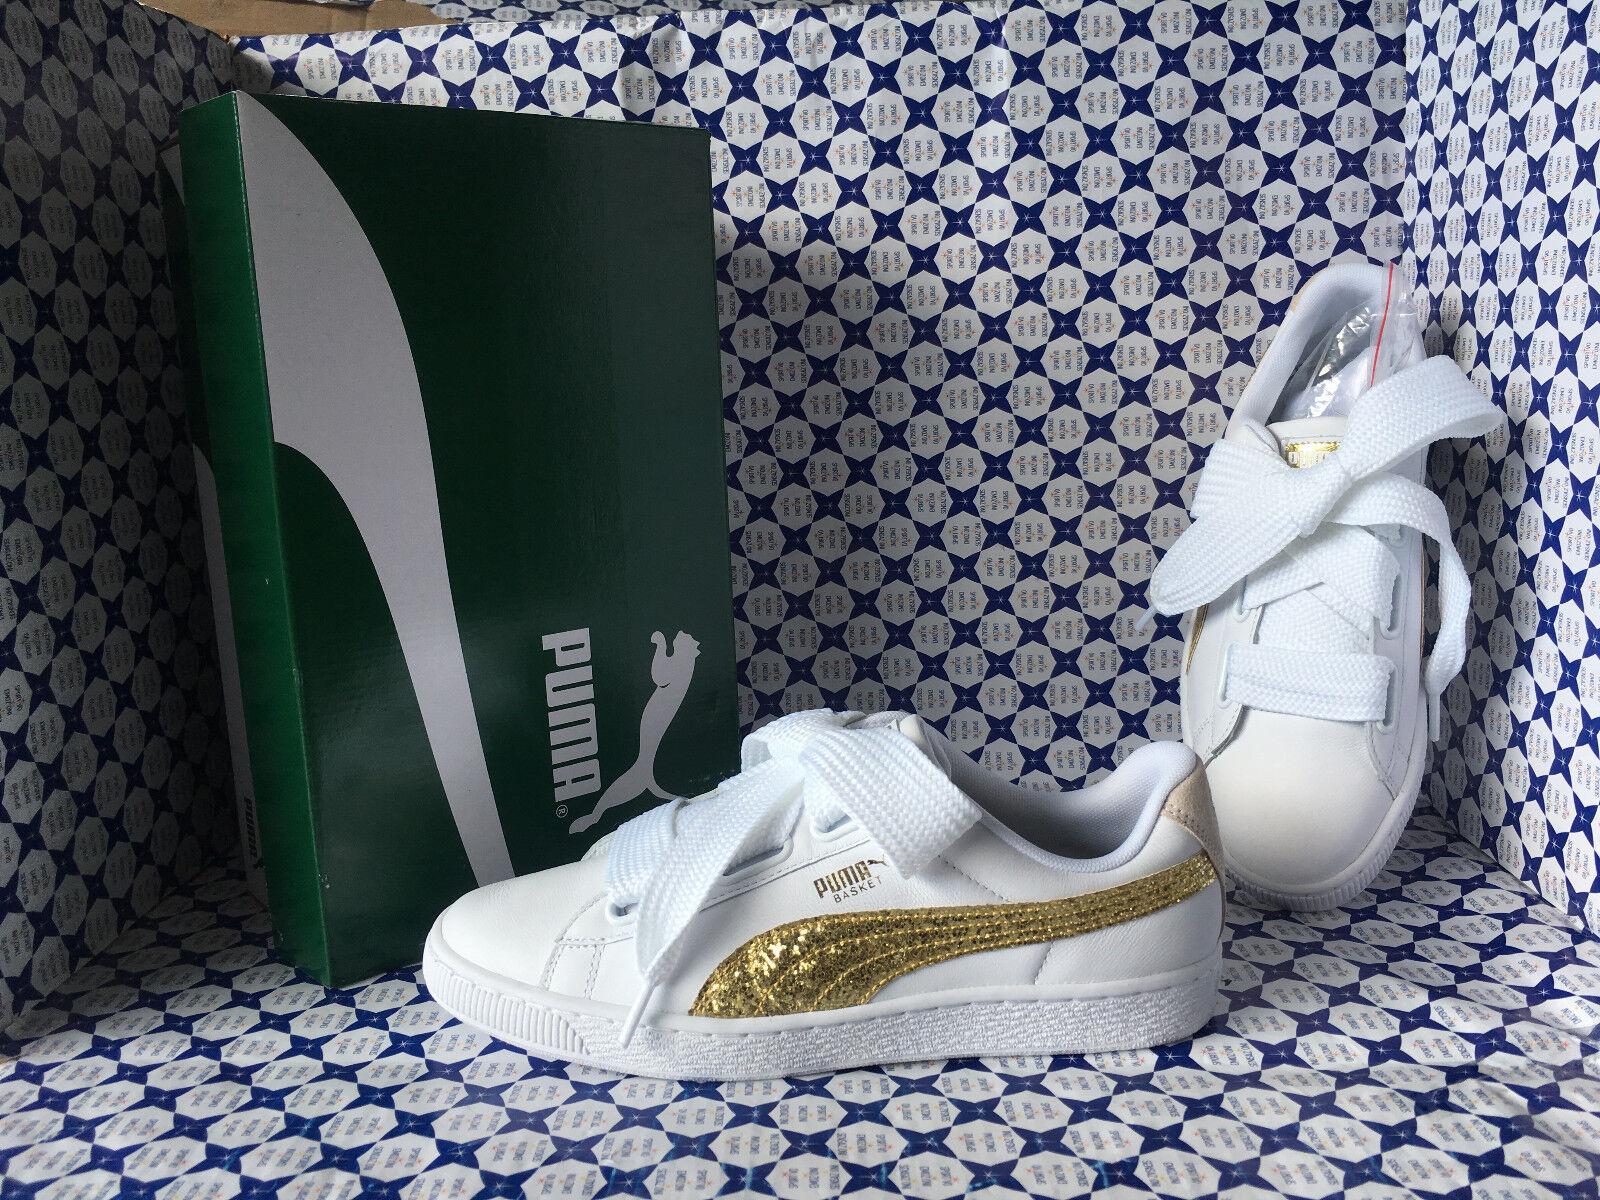 shoes Puma women SCONTATE   Basket Heart Glitter - Bianco gold - 364078